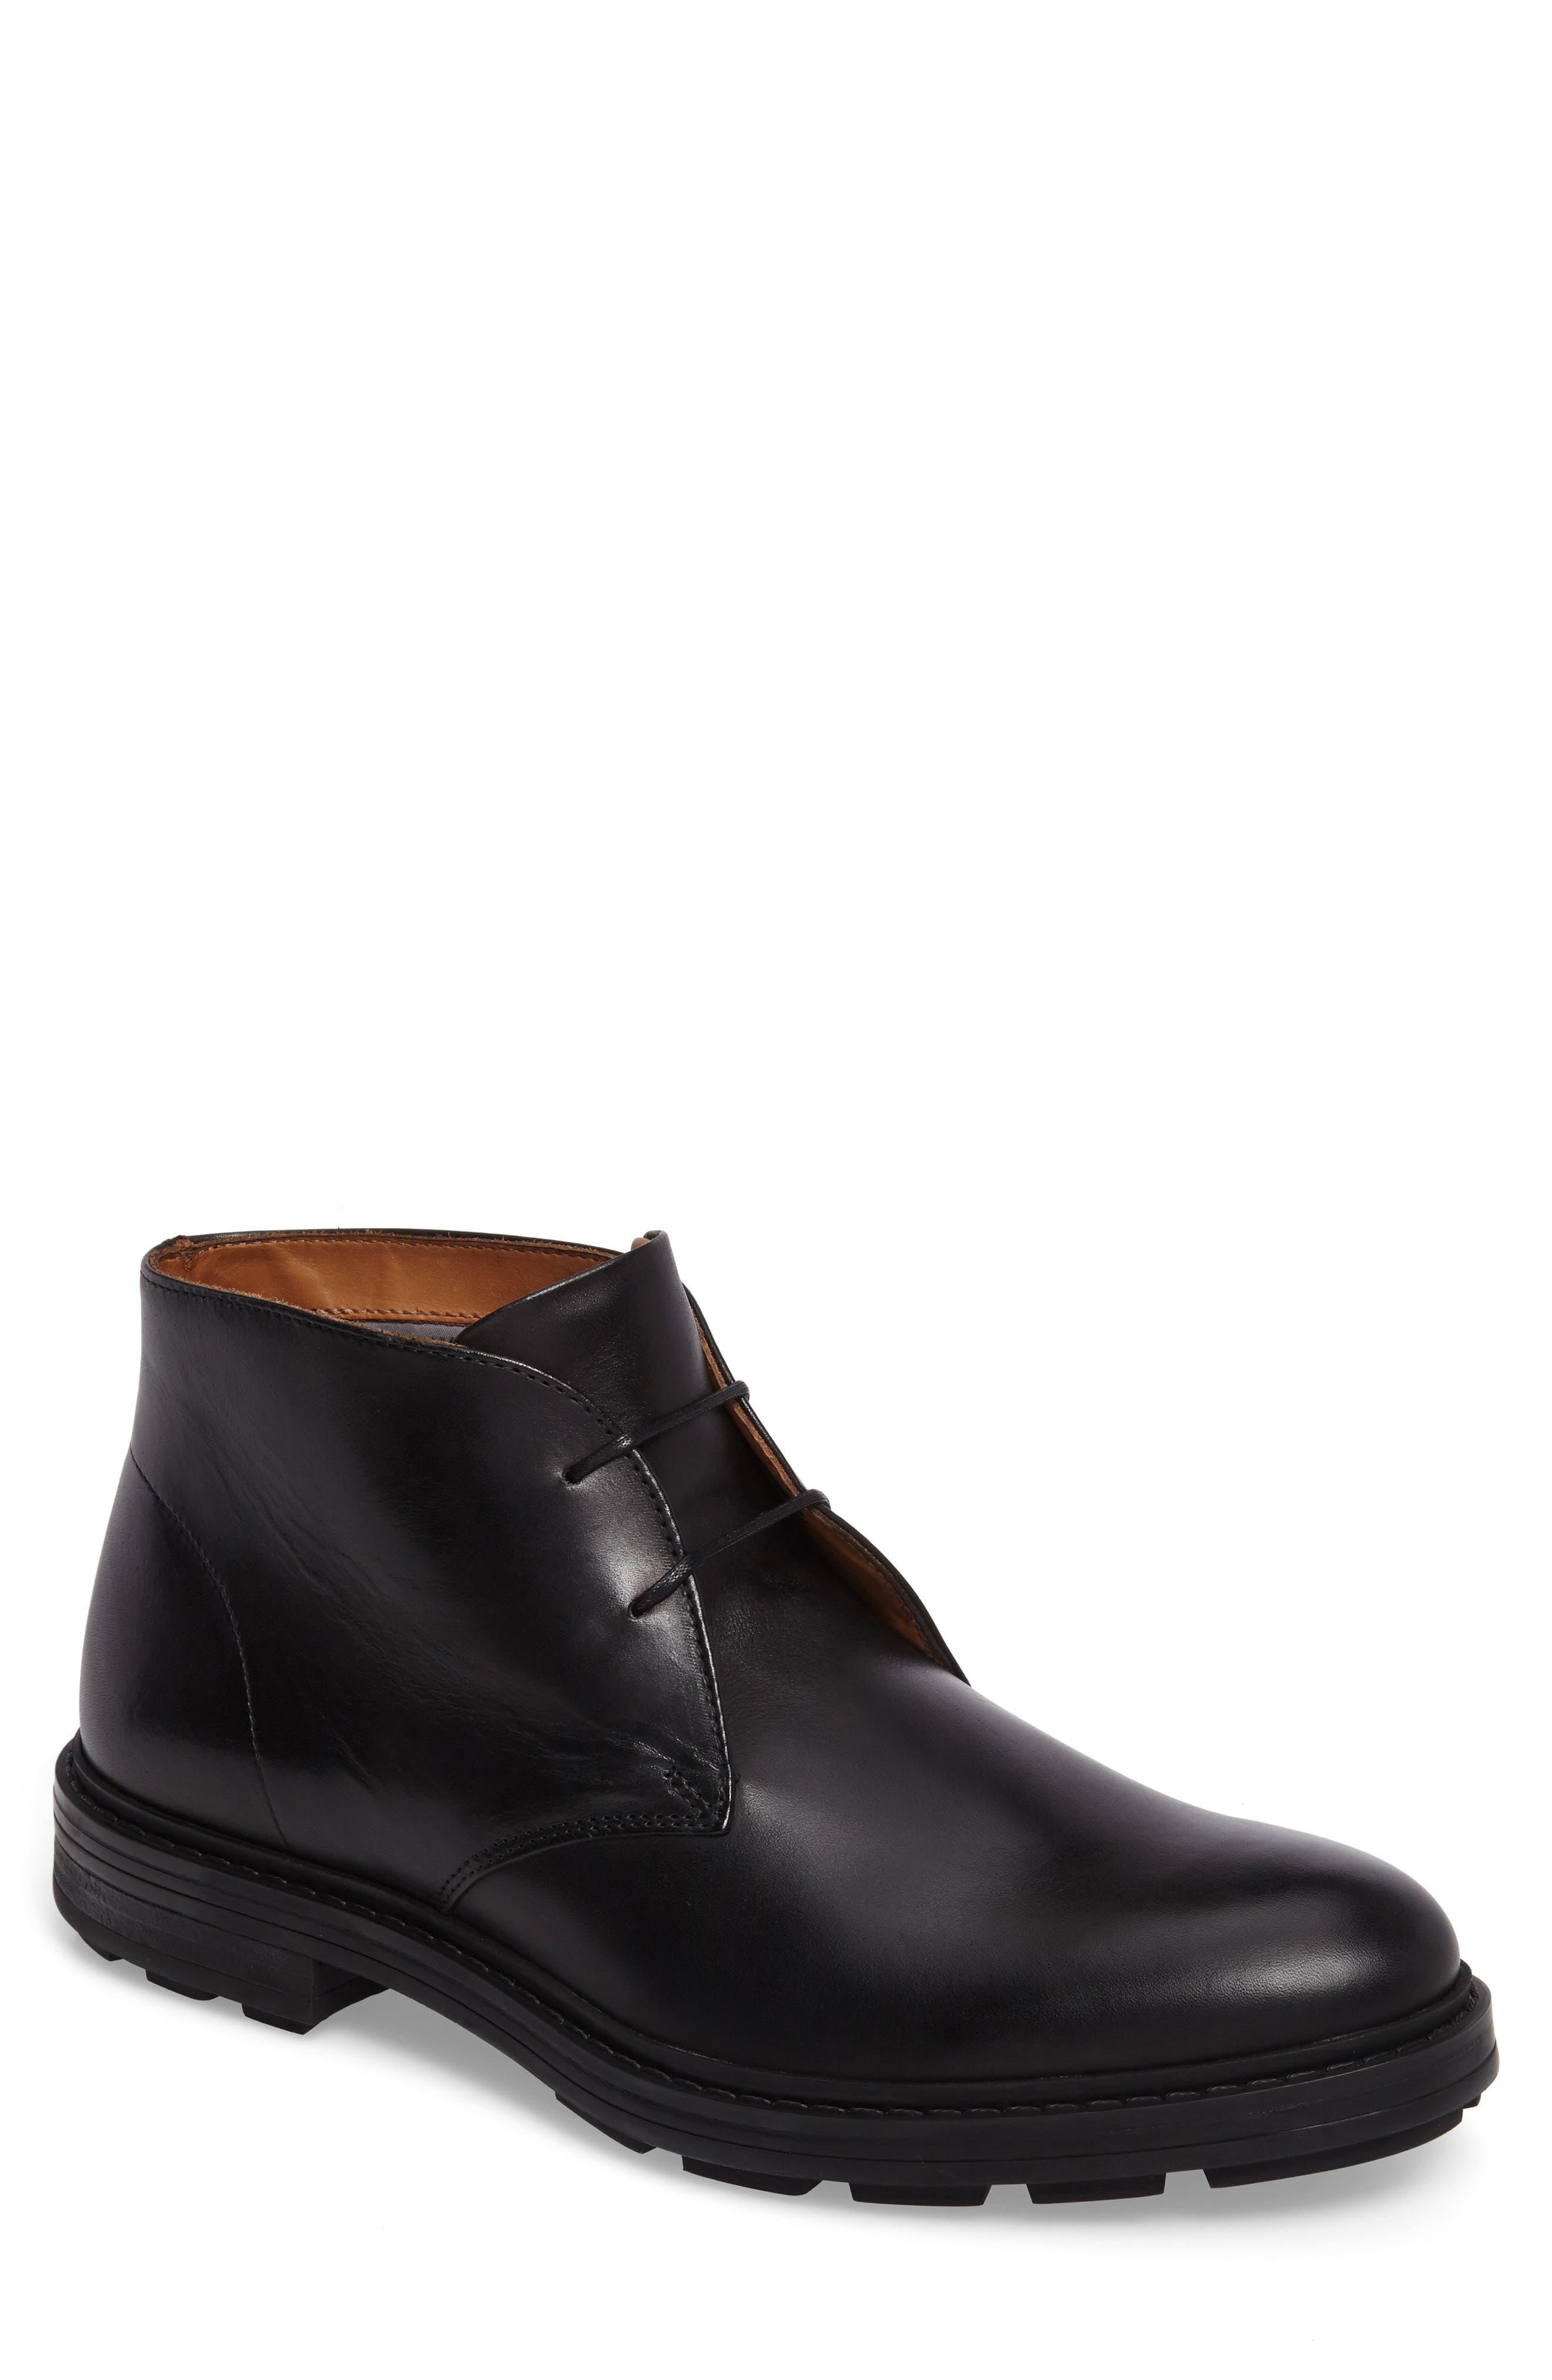 Kritter Chukka Boot,                         Main,                         color, 001